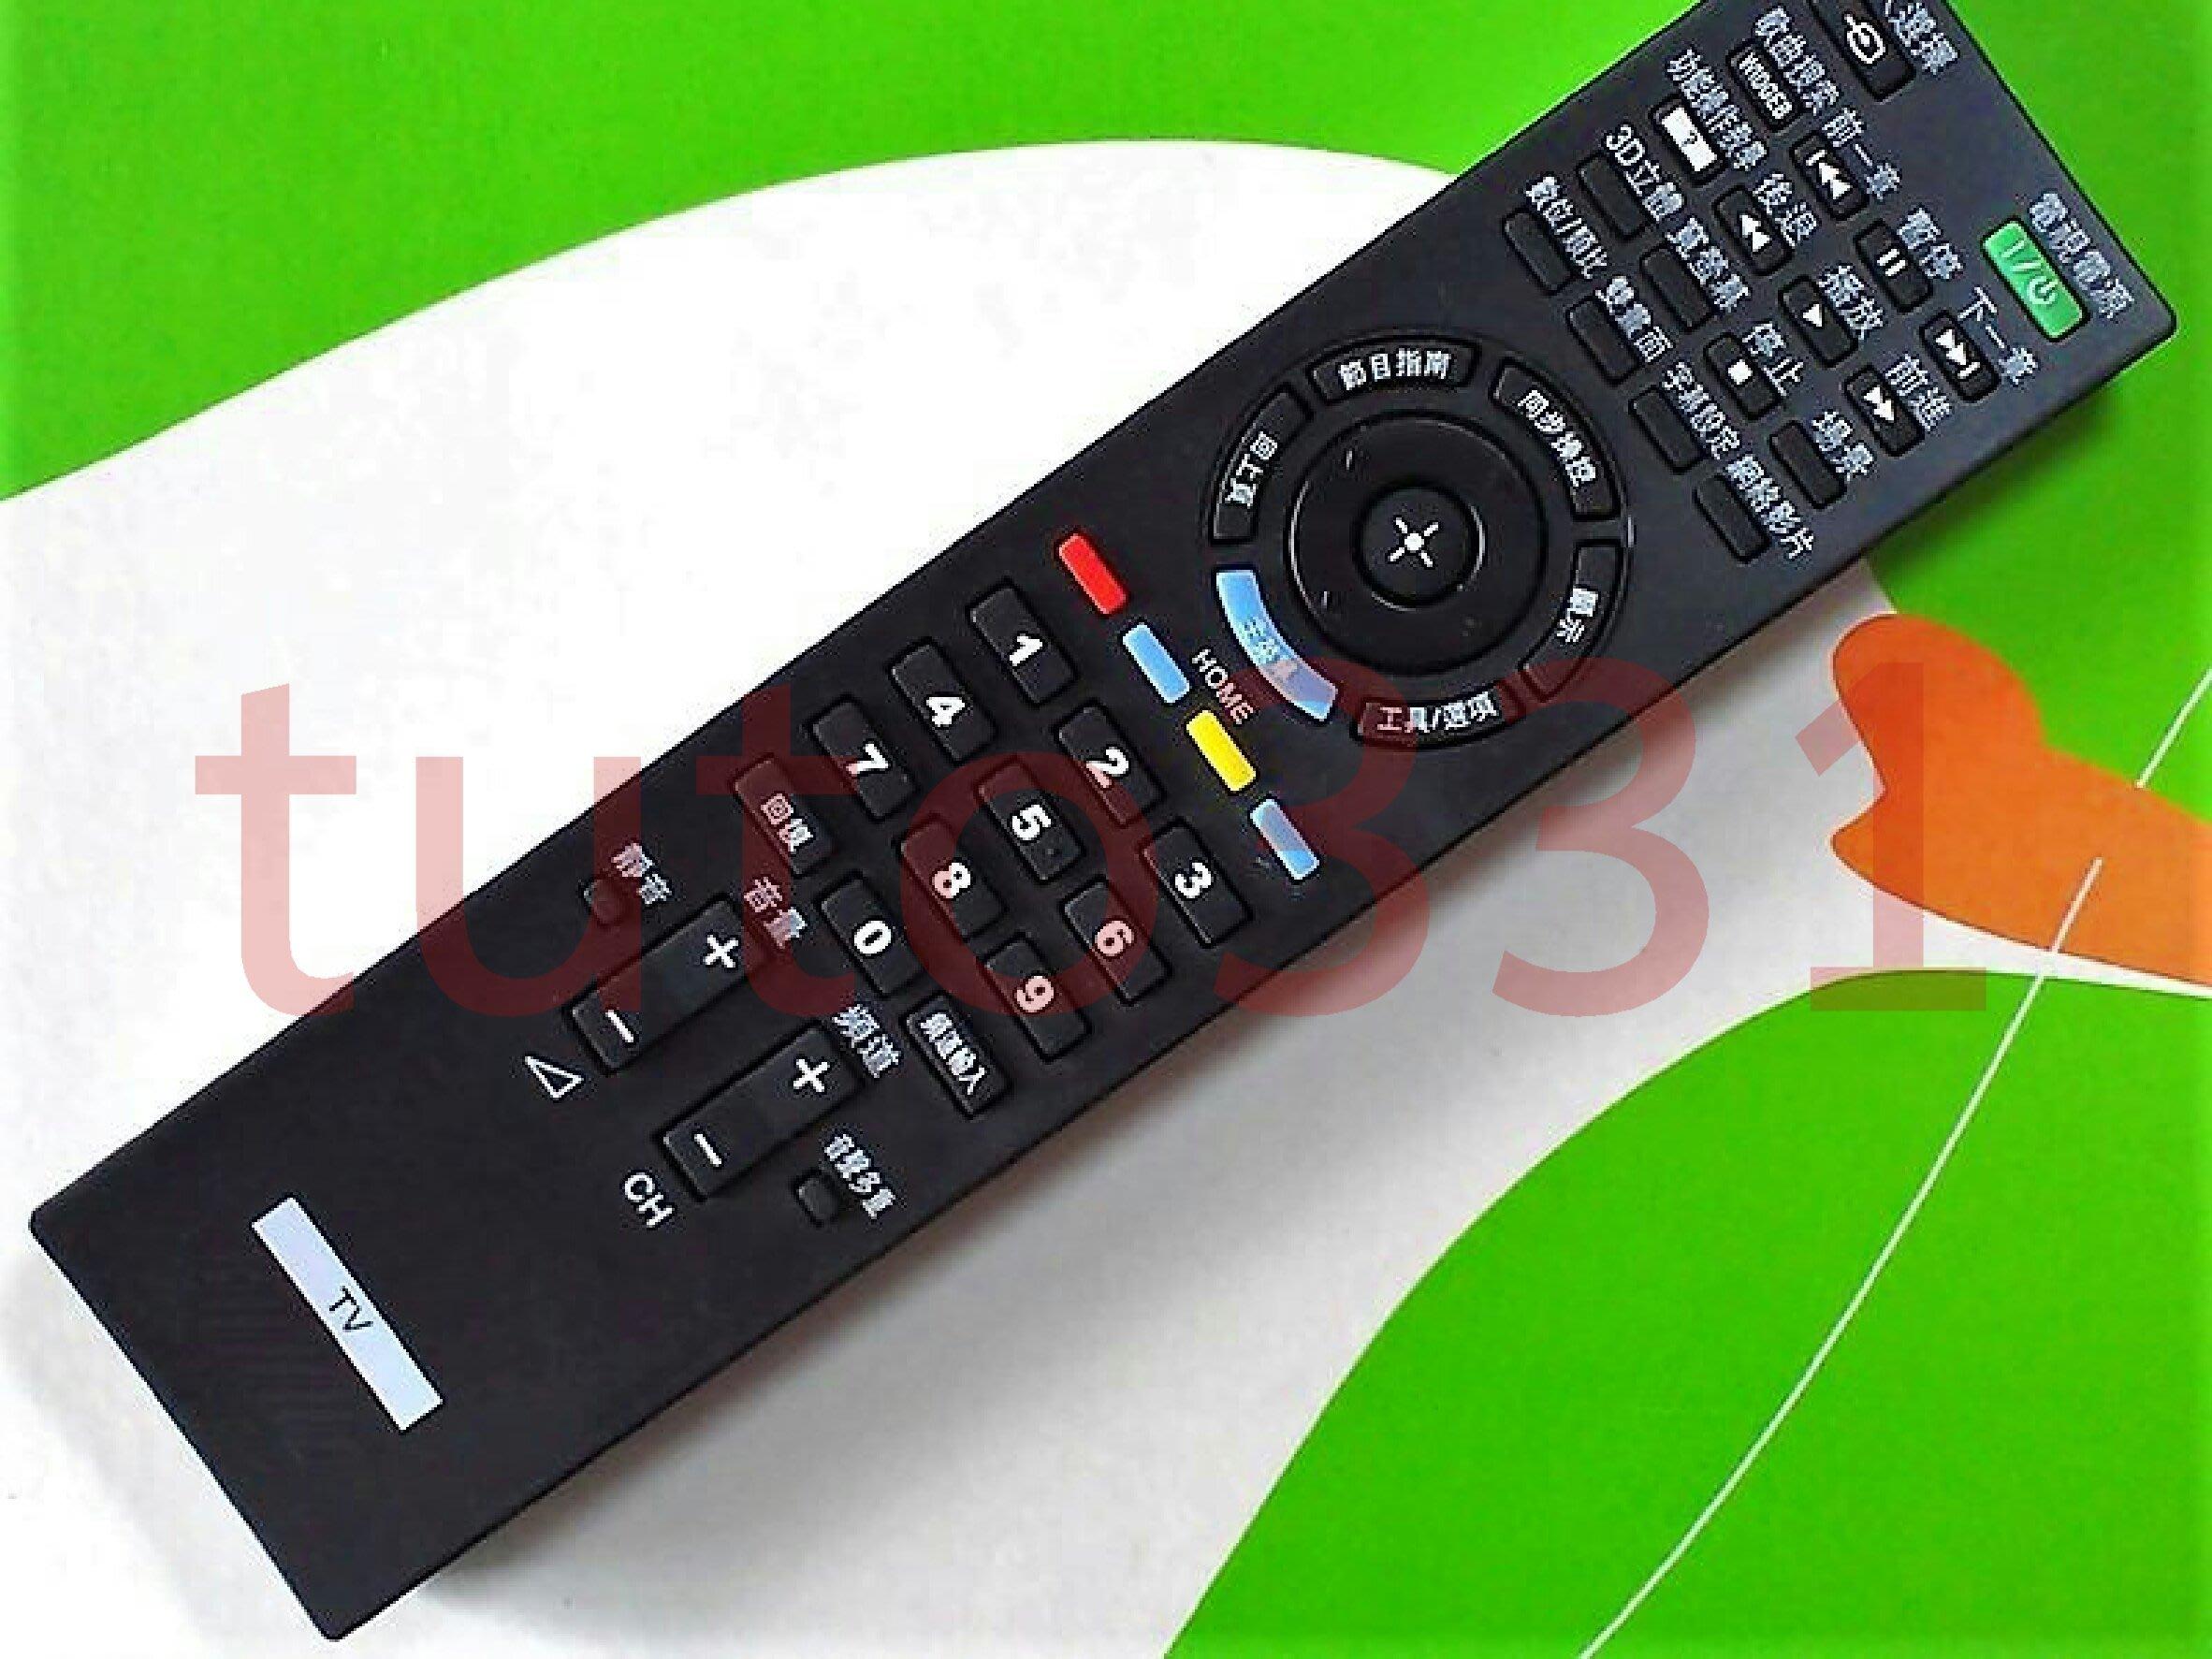 SONY液晶電視遙控器 KDL-50W700A KDL-52EX500 KDL-52Z5500 KDL-55NX720